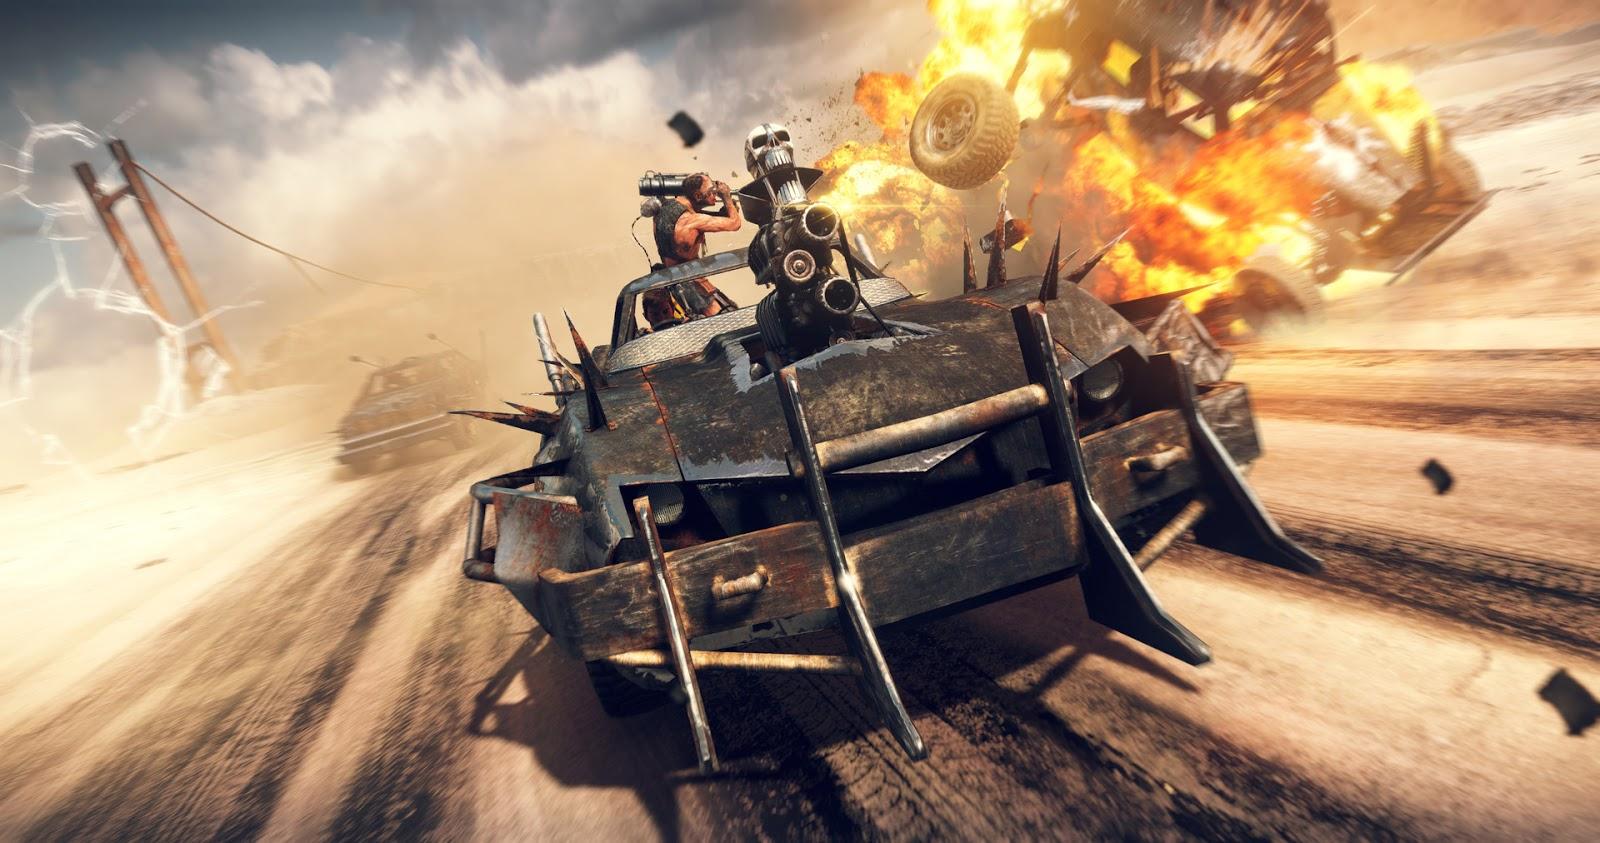 Mad Max ESPAÑOL PC Descargar Full (CPY) + REPACK 6 DVD5 (JPW) 4